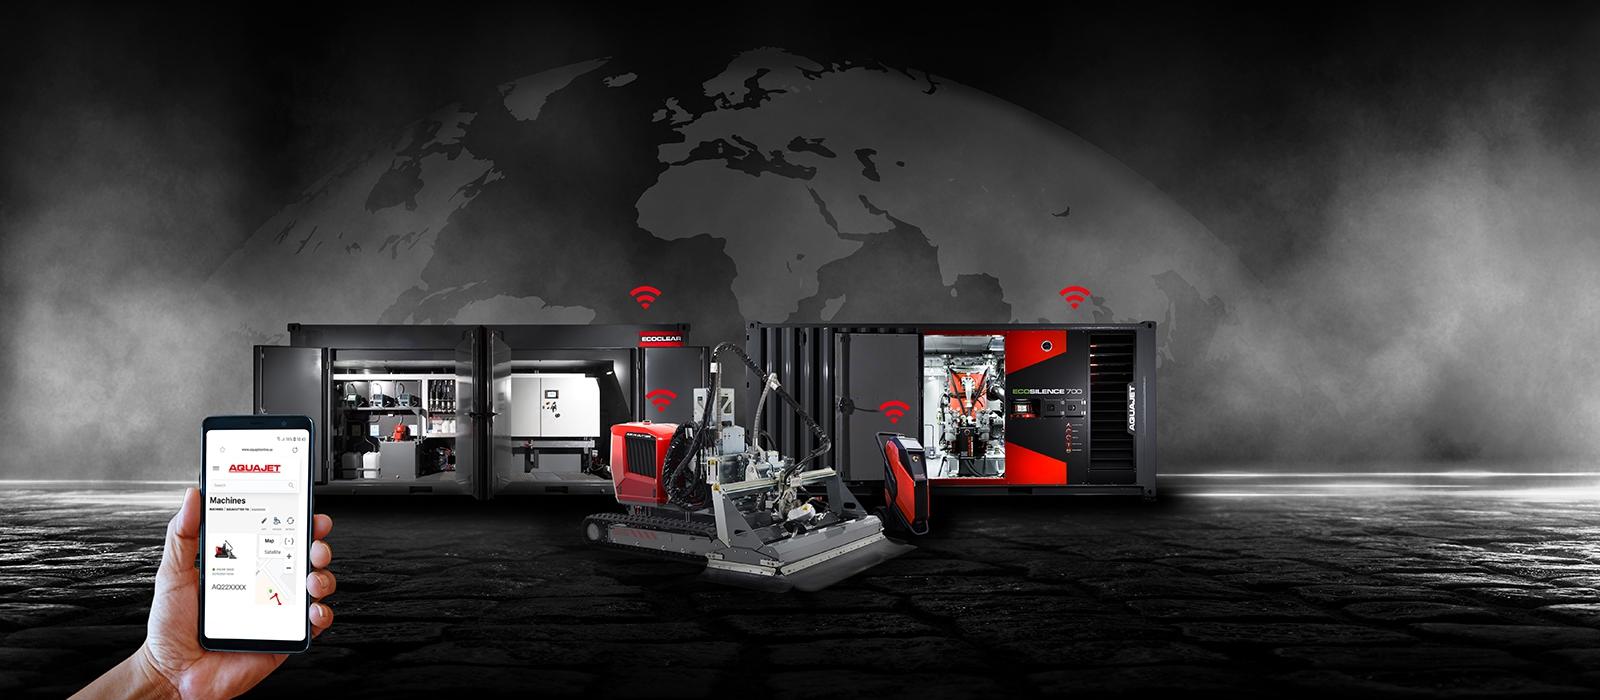 aquajet hydrodemolition online industry 4.0 equipment ergo aqua cutter ecoclear ecosilence power pack